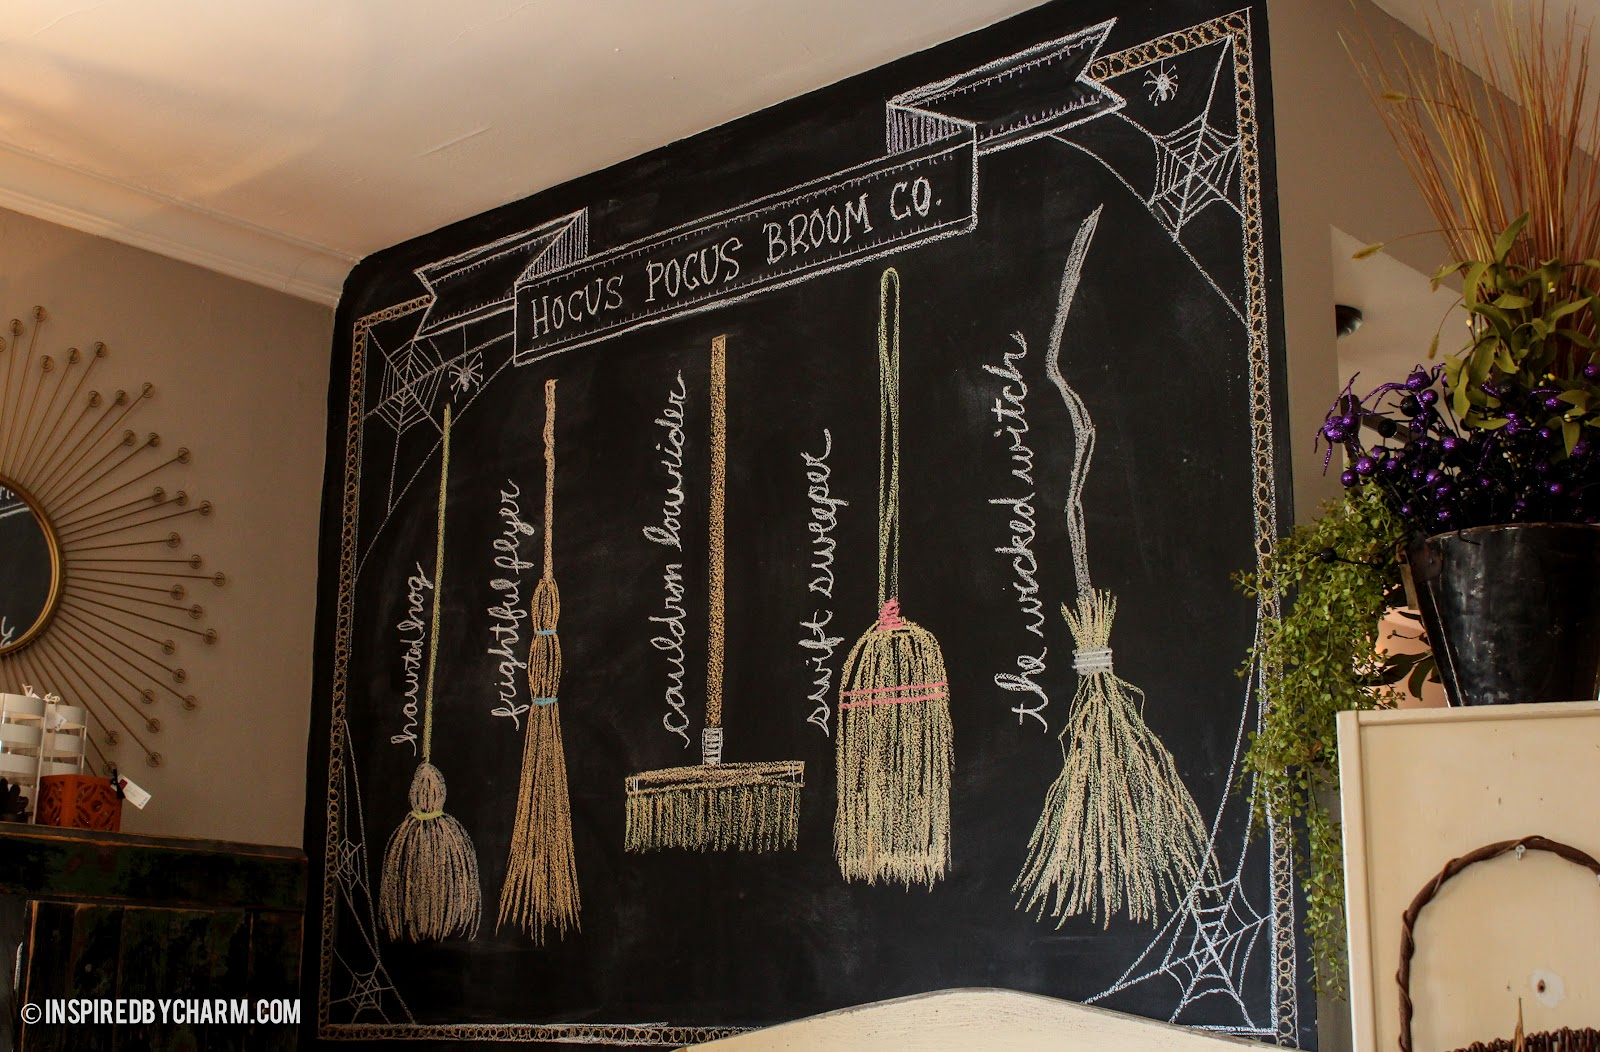 hocus pocus broom co. Black Bedroom Furniture Sets. Home Design Ideas